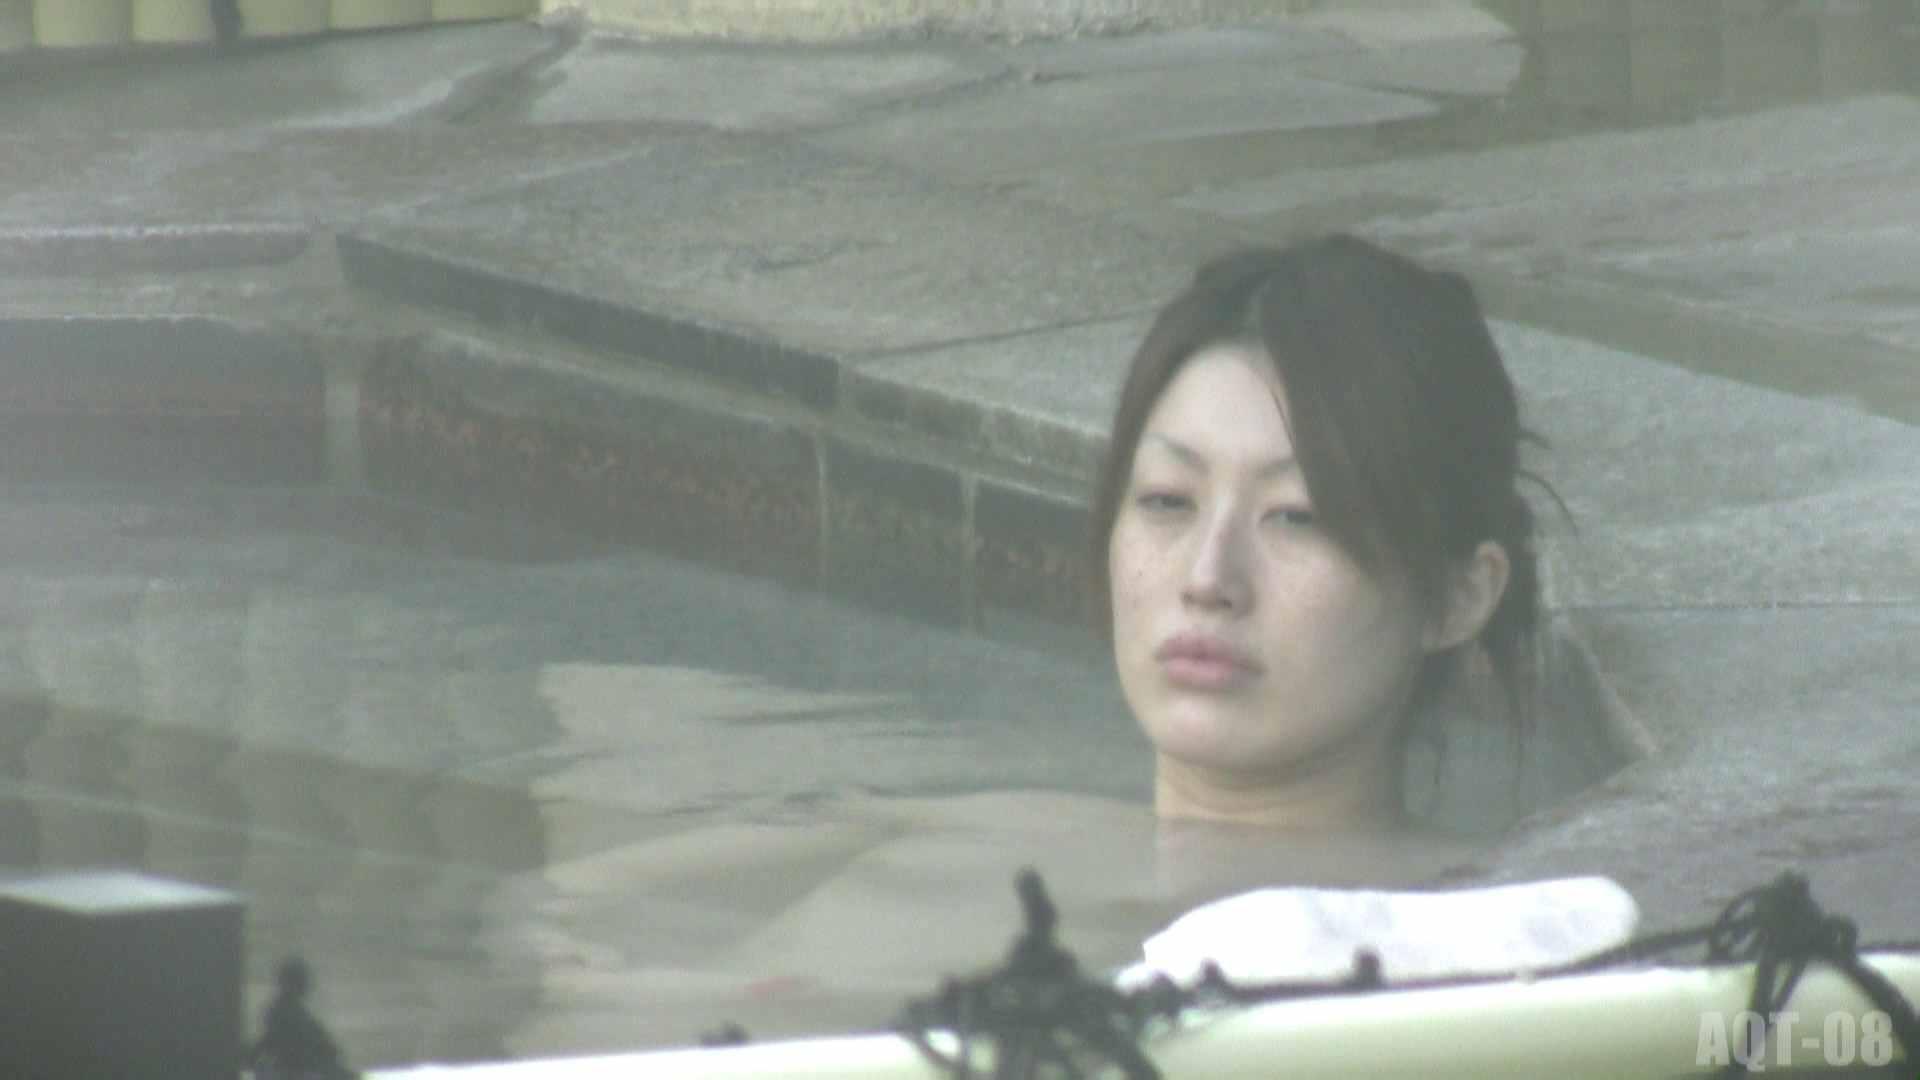 Aquaな露天風呂Vol.775 盗撮映像  74Pix 54